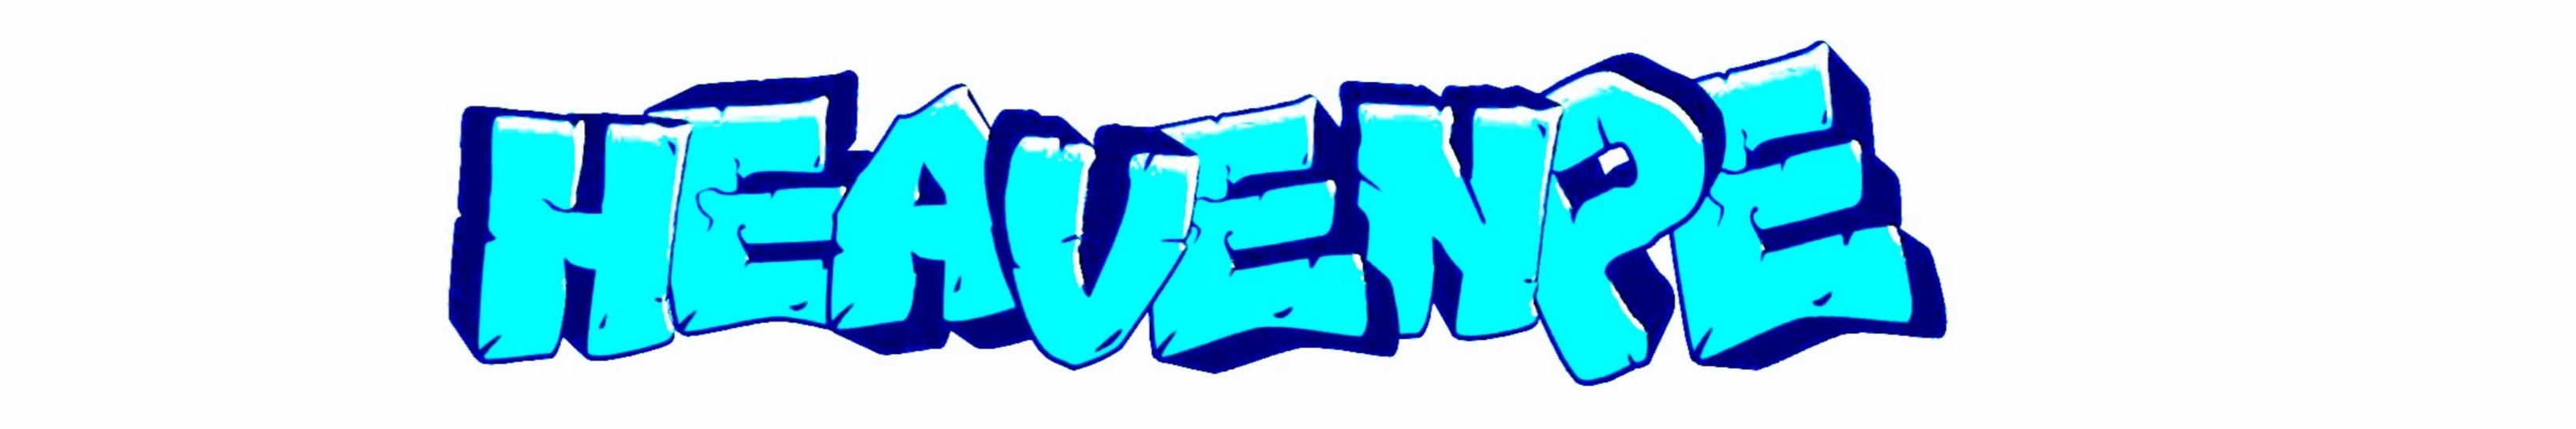 Banner for HeavenPE Minecraft server